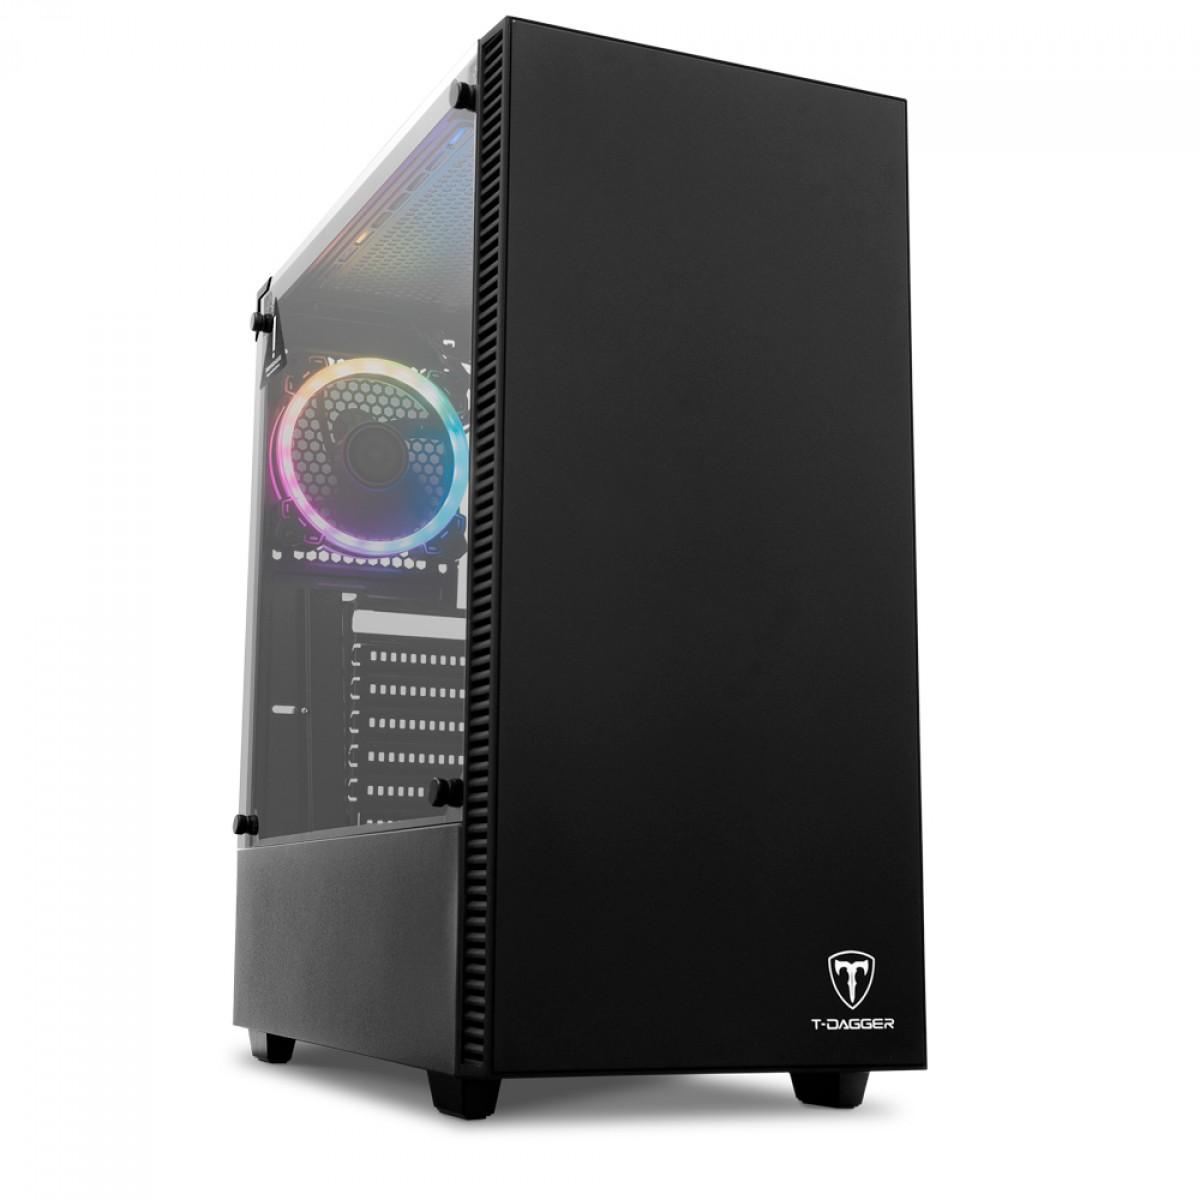 Computador Gamer, RYZEN 5 3600, Placas de Vídeo GTX-1050TI 4GB DDR5, 8GB DDR4, HD 1TB